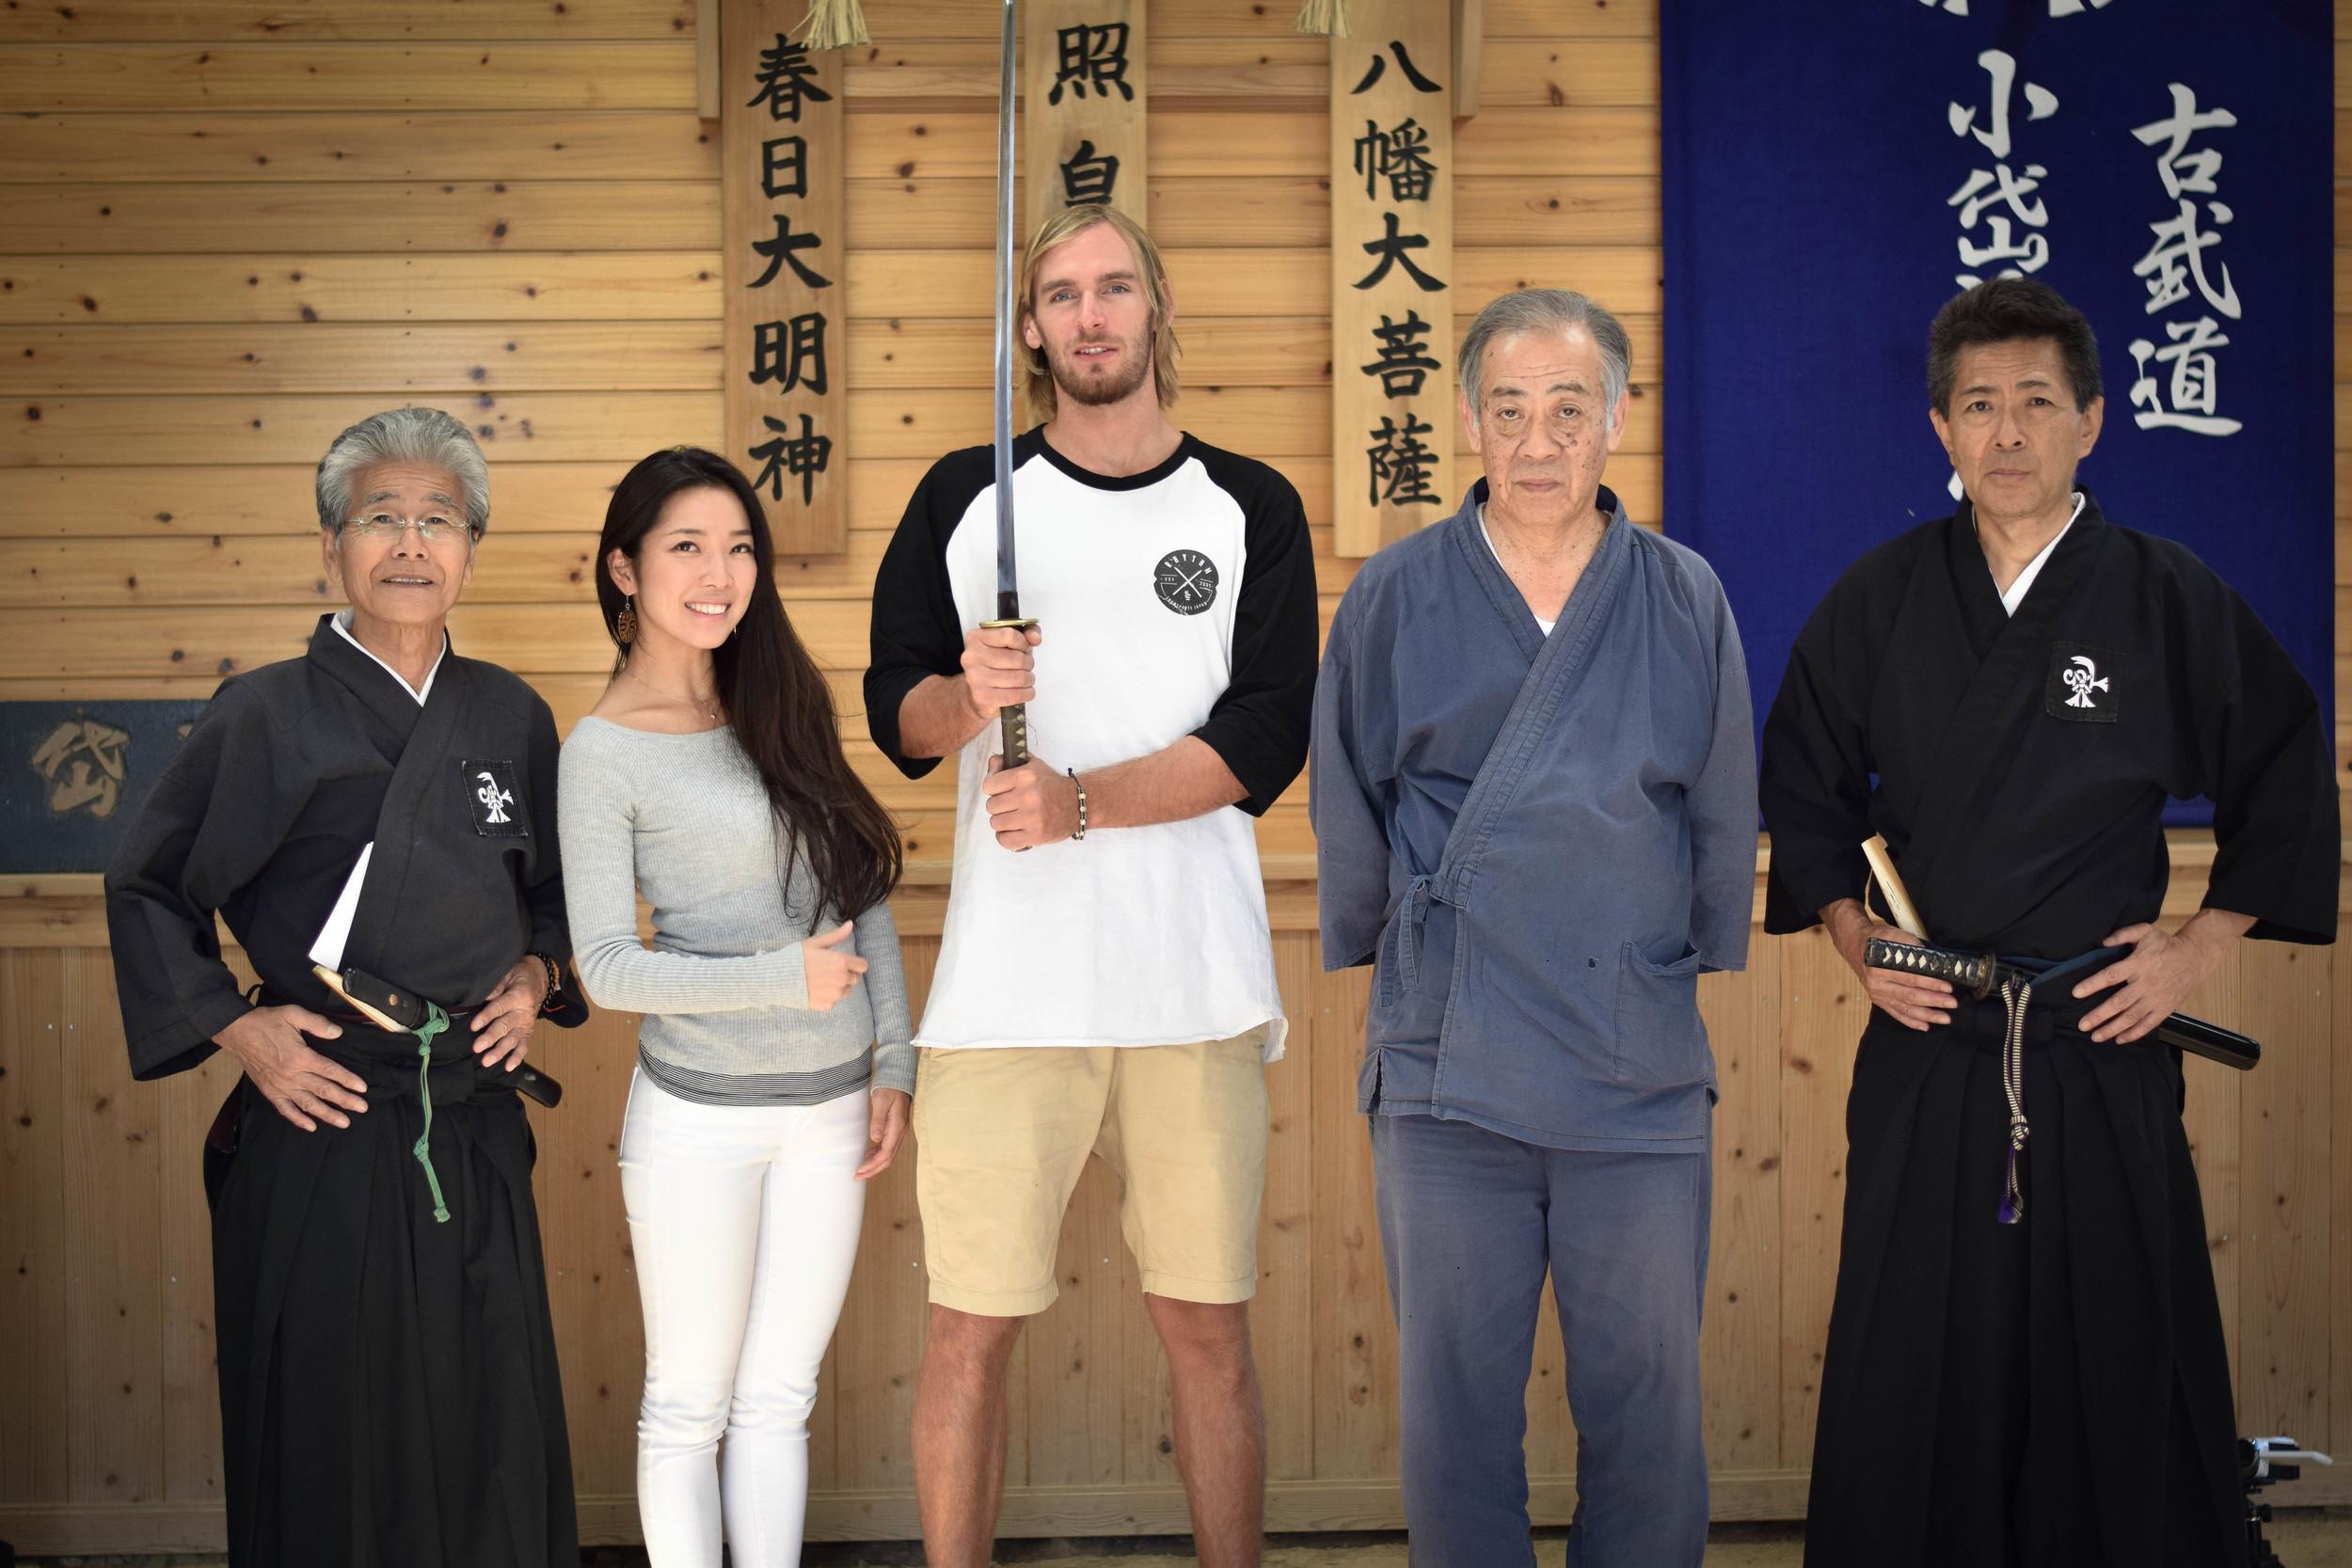 Group photo with Sensei Genrokuro Matsunaga and his disciples at his home Dojo, Genseikai dojo